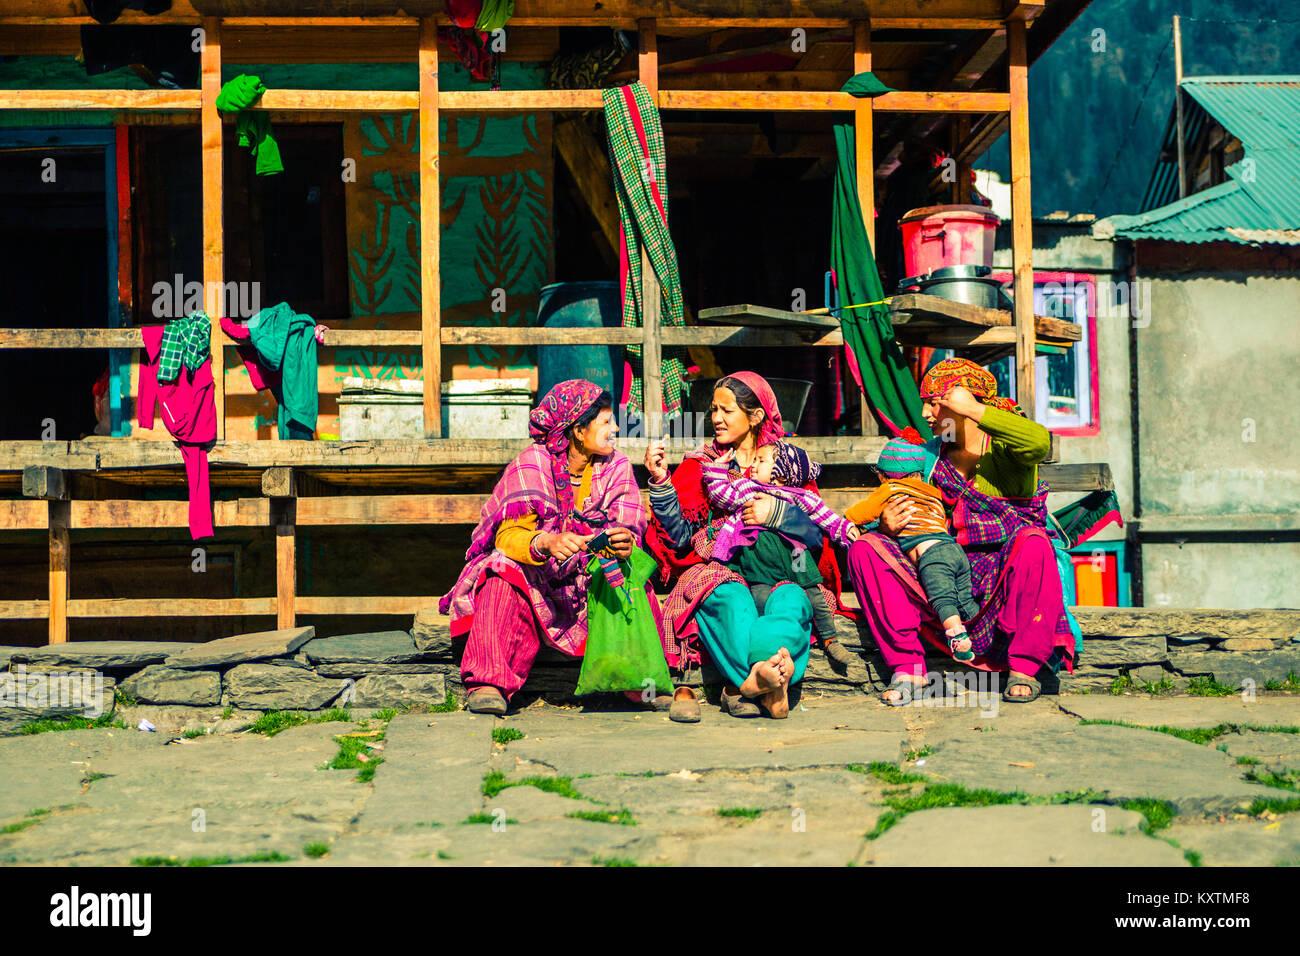 Malana Village - Himachal Pradesh - India © Sauriêl Ltd | Samantha Scholl | fb.com/SaurielPhotography | www.saurielcreative.com Stock Photo